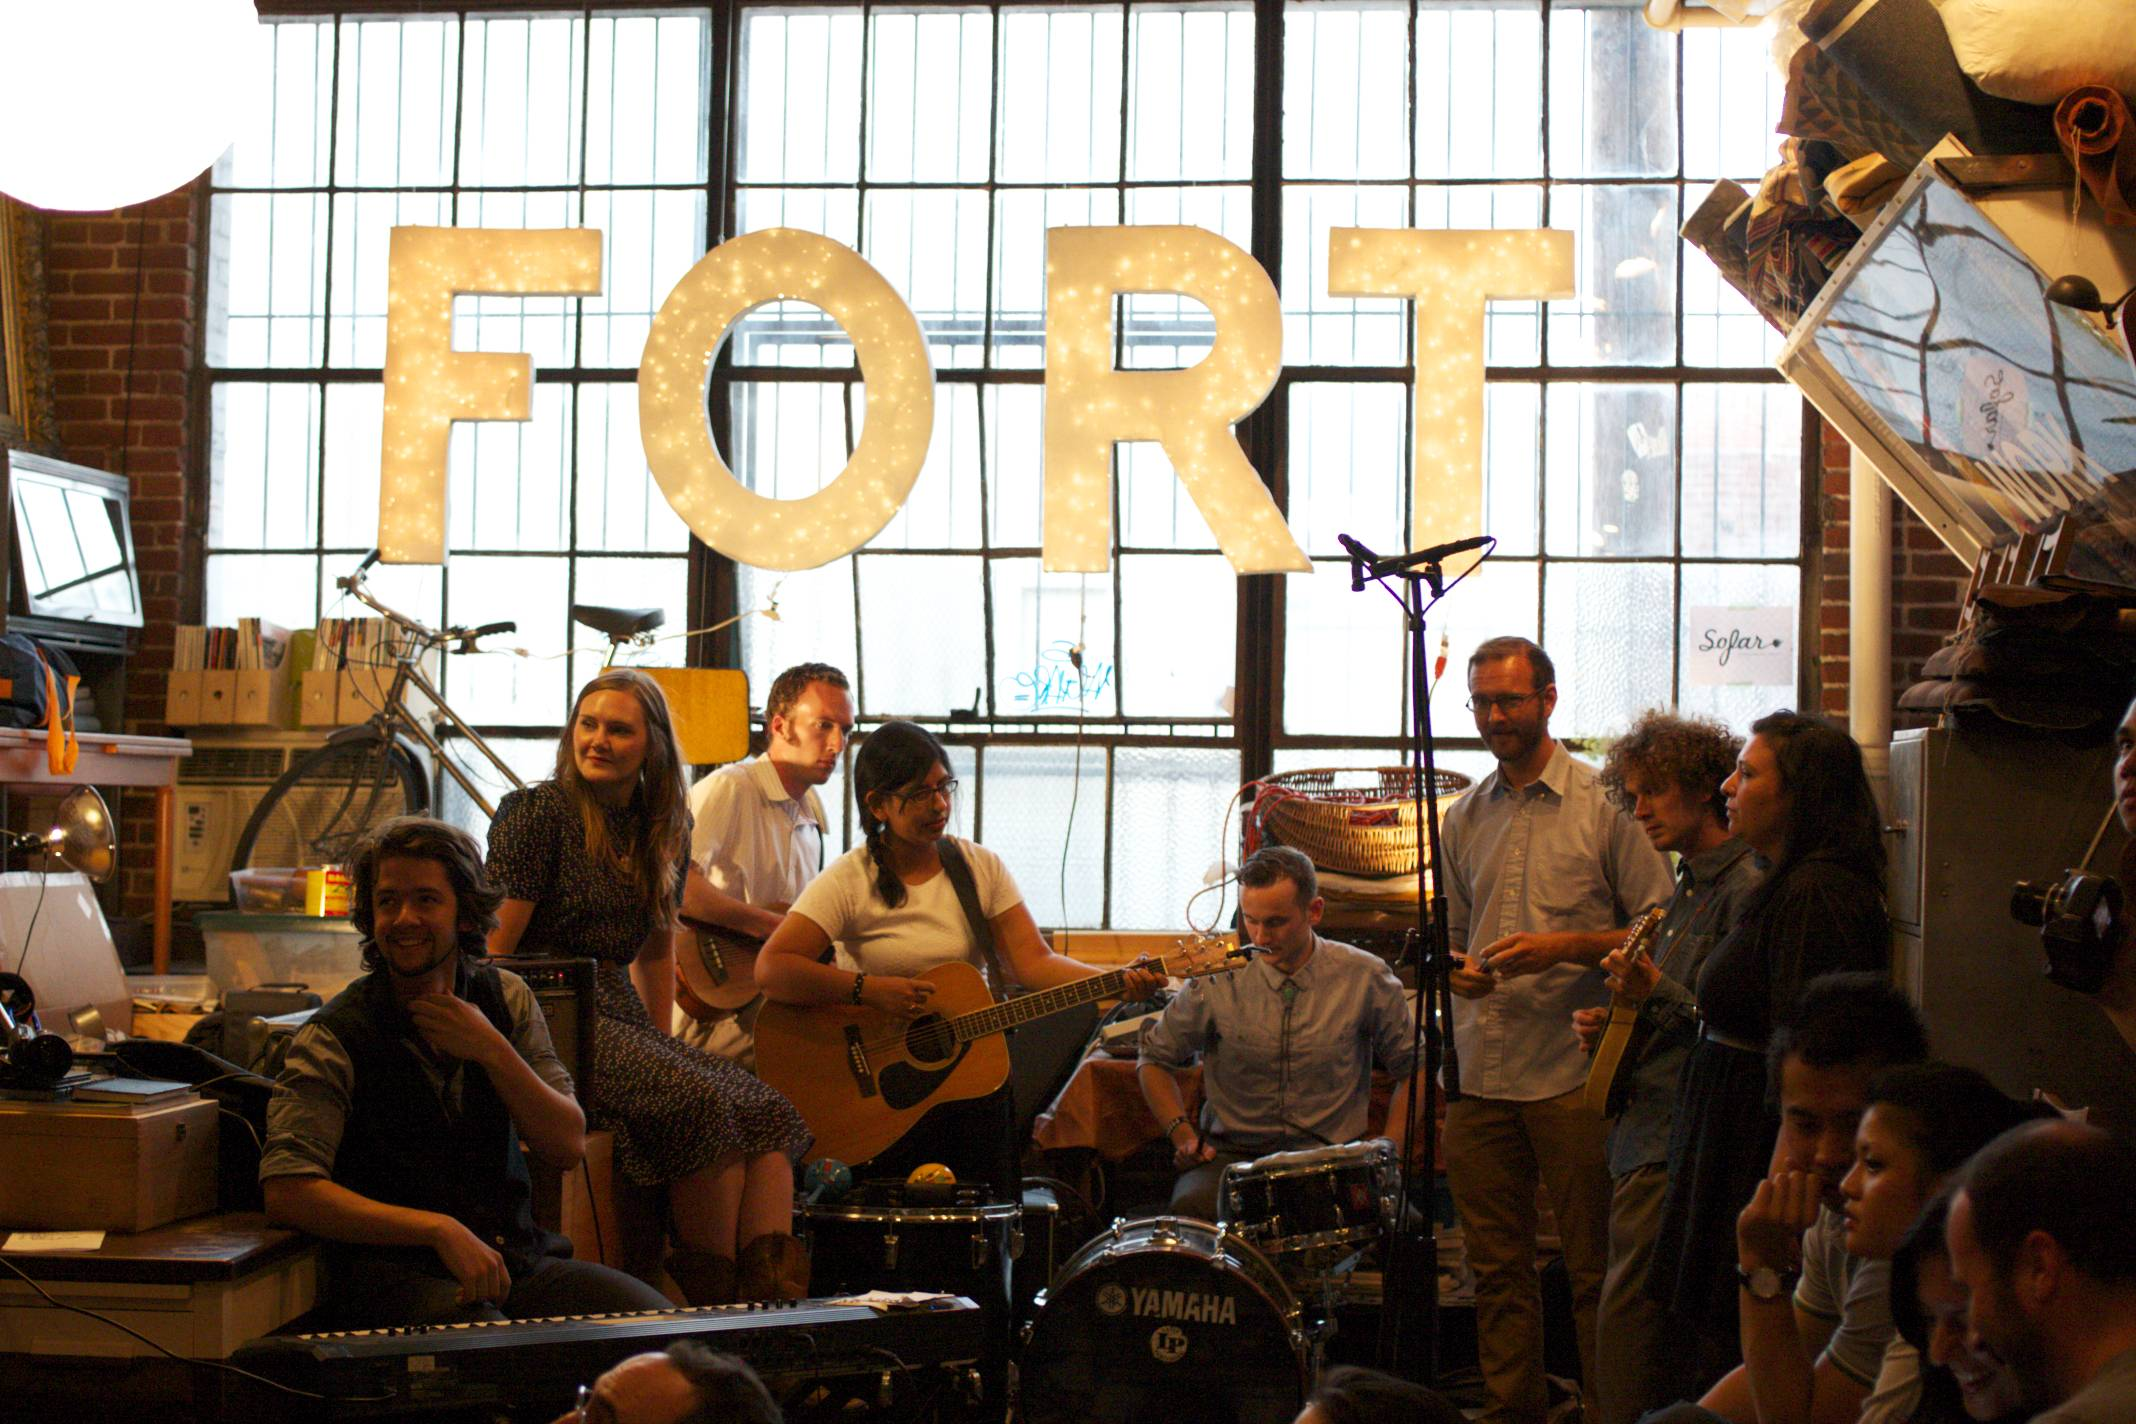 The Eagle Rock Gospel Choir at BUNCH Magazine x Sofar Sounds show at FORT